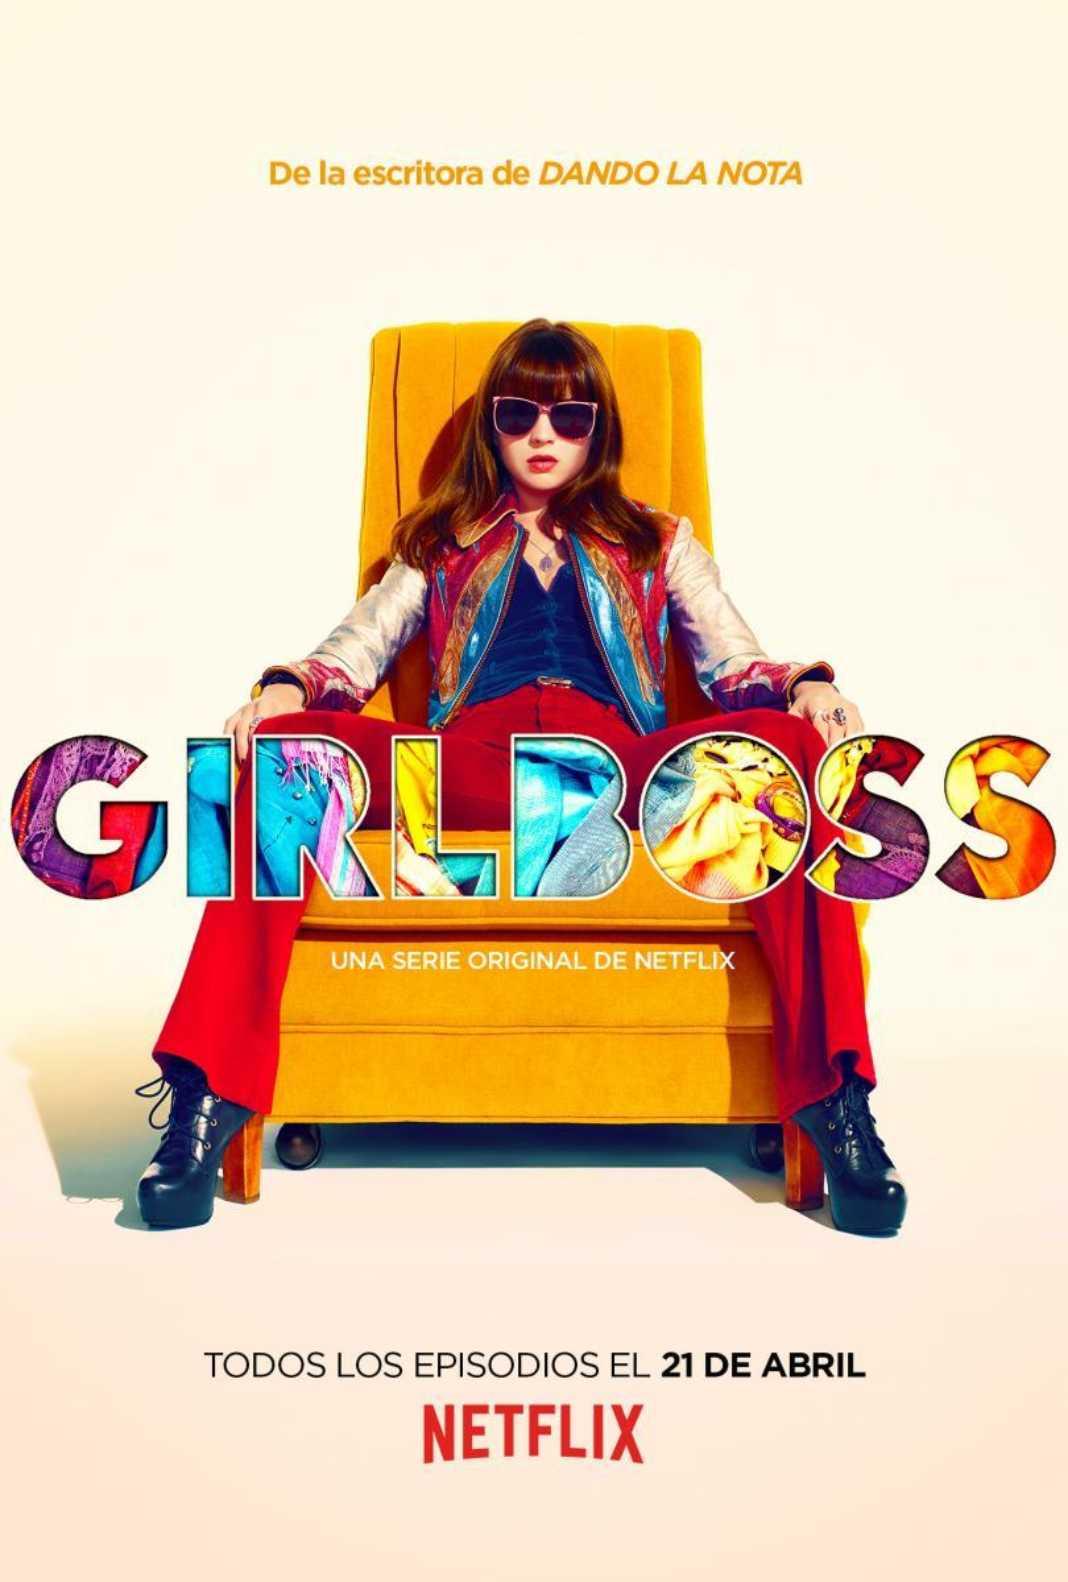 Yolanda Portillo pone voz a Annie en la serie Girlboss de Netflix 2